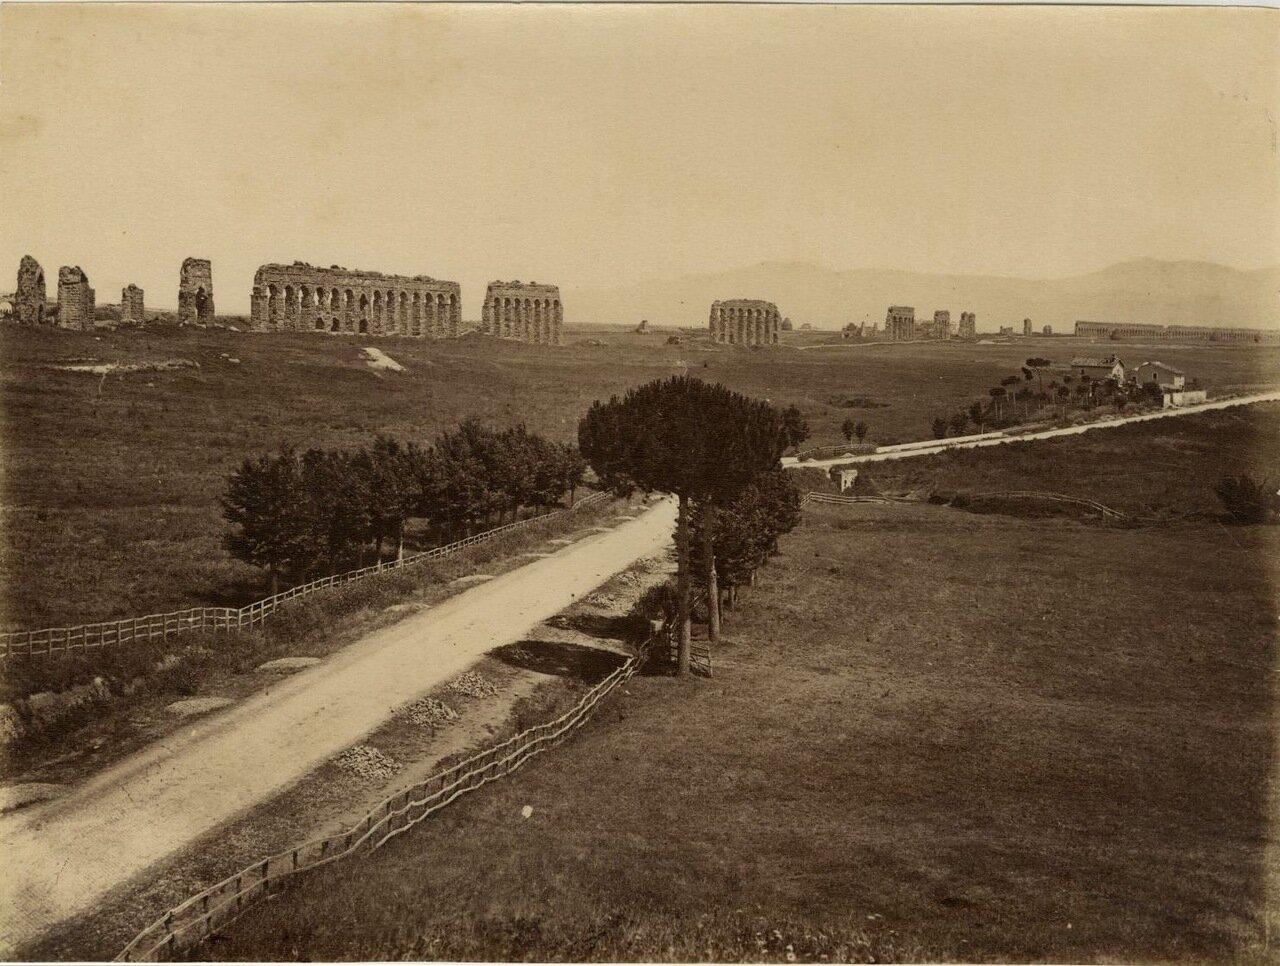 Аппиева дорога и акведук Клавдия. 1870.